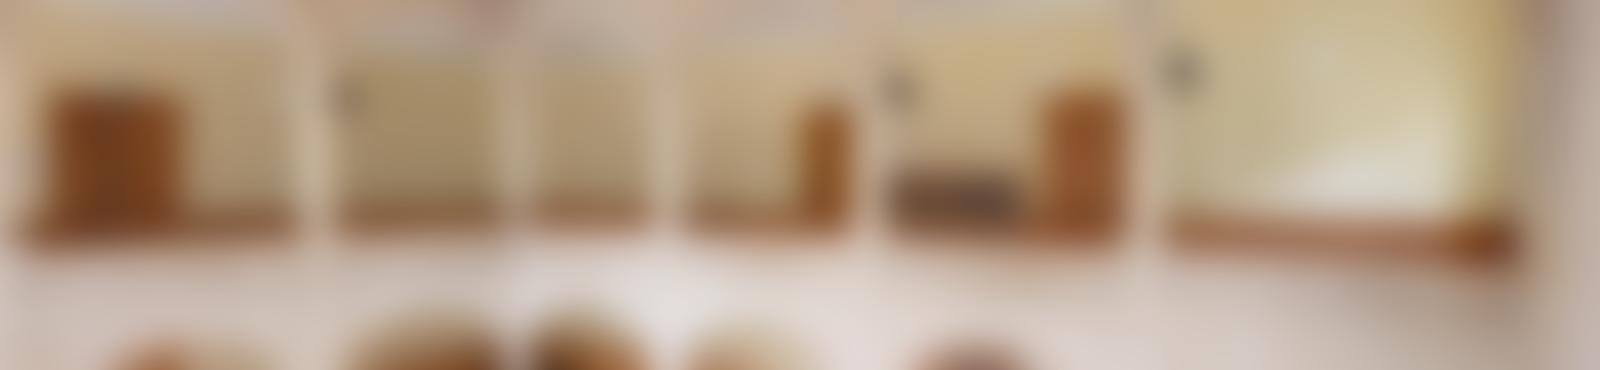 Blurred e67248d5 c90d 423a aa38 7f9decbad413